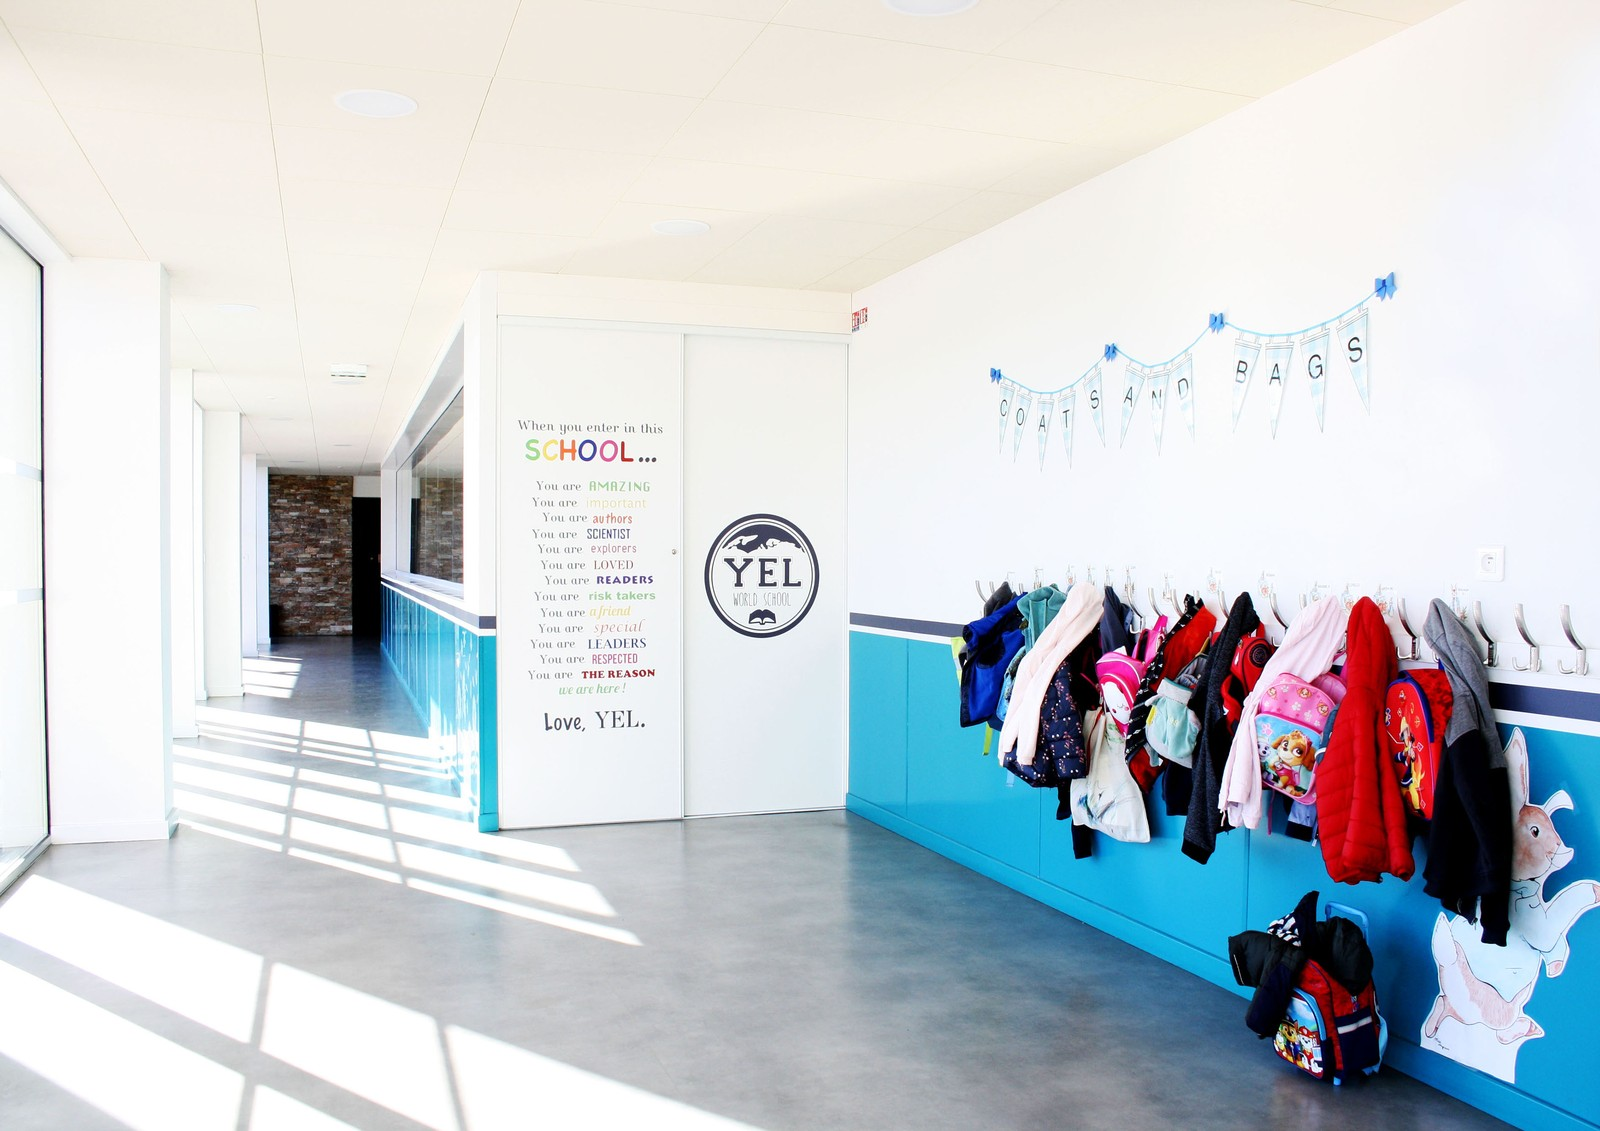 Ecole Bilingue Yel School – Perpignan